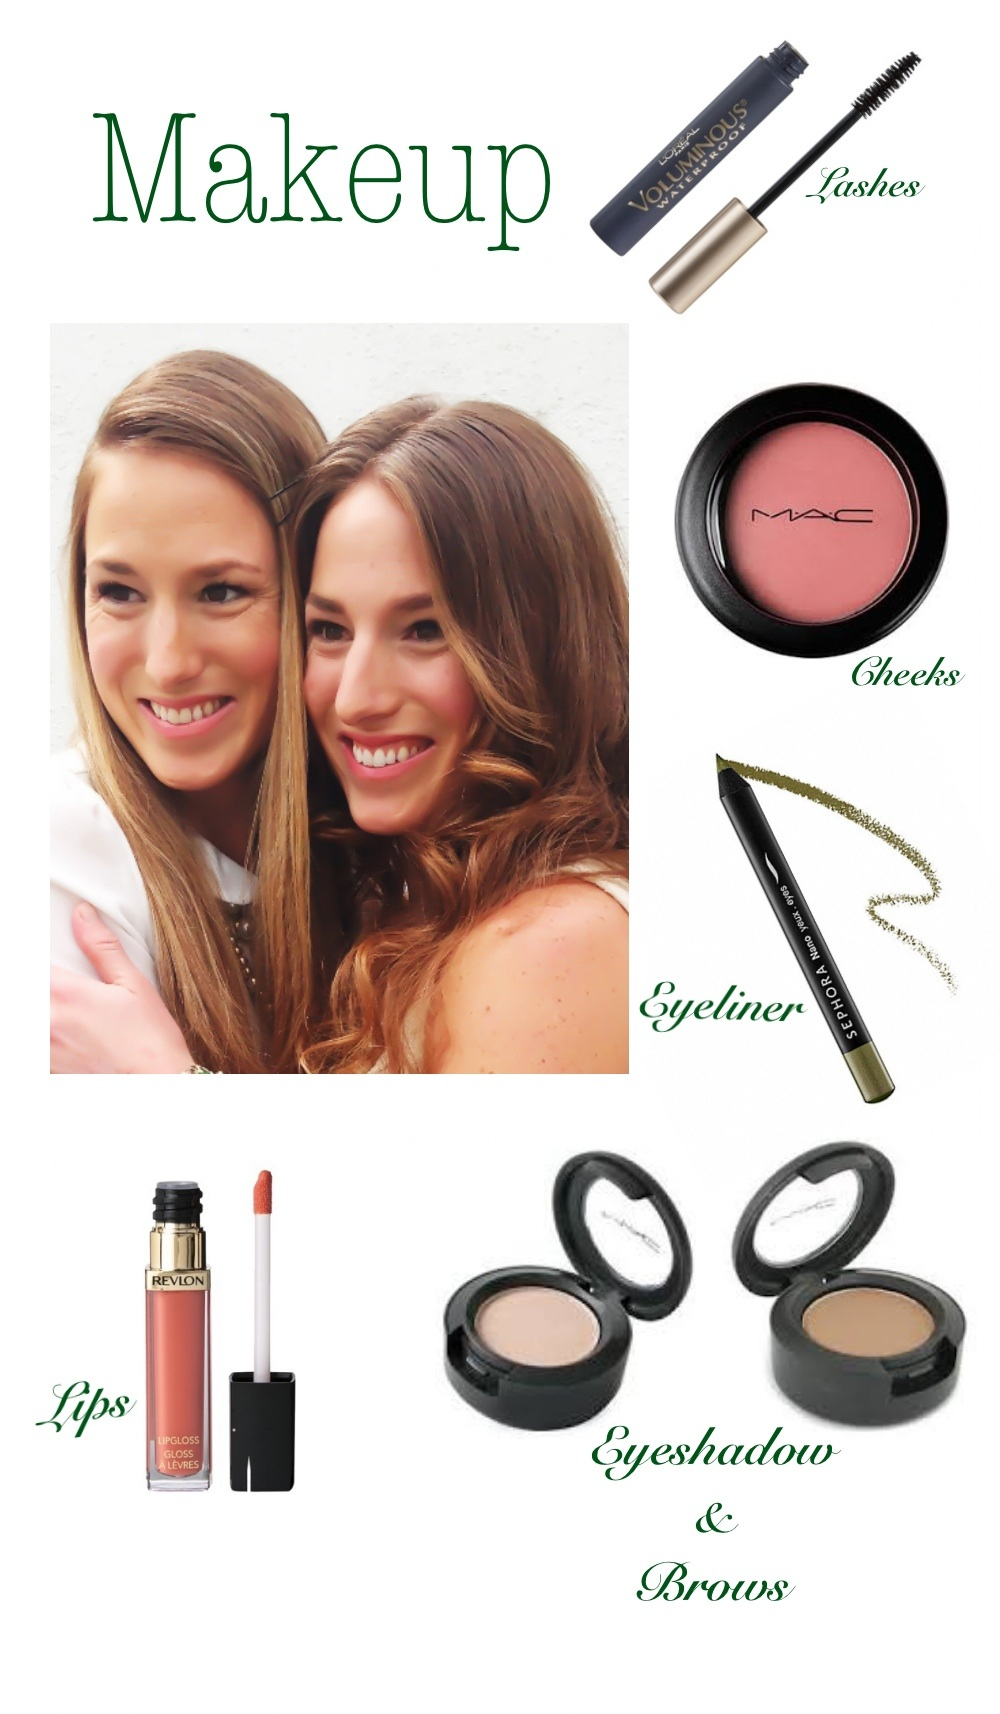 Tripletliving has fabulous beauty tips!